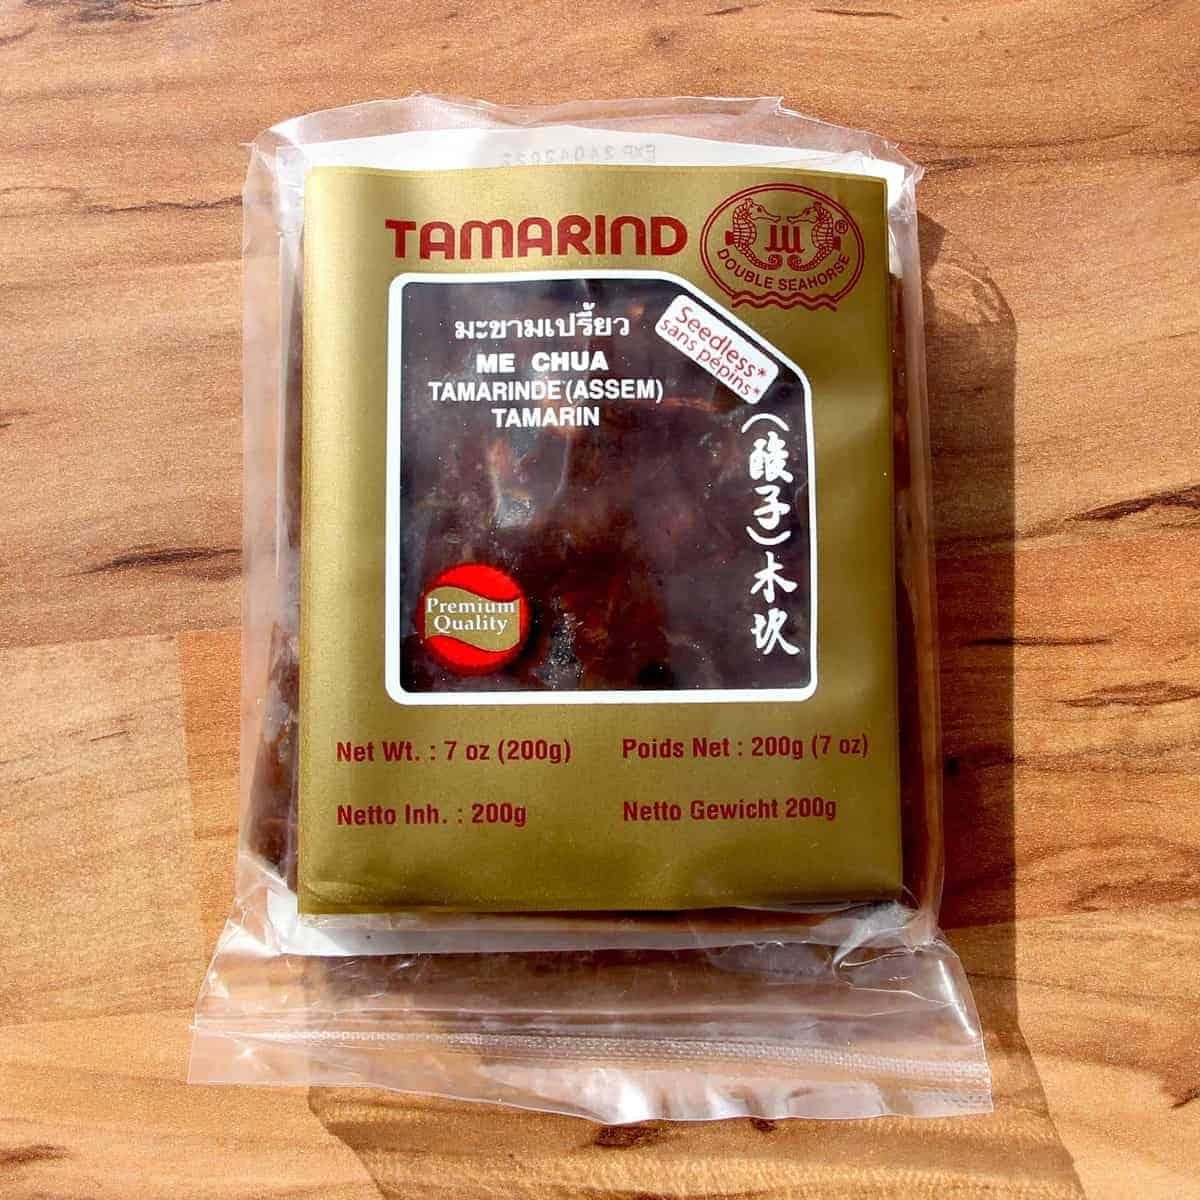 Tamarind paste in a bag.